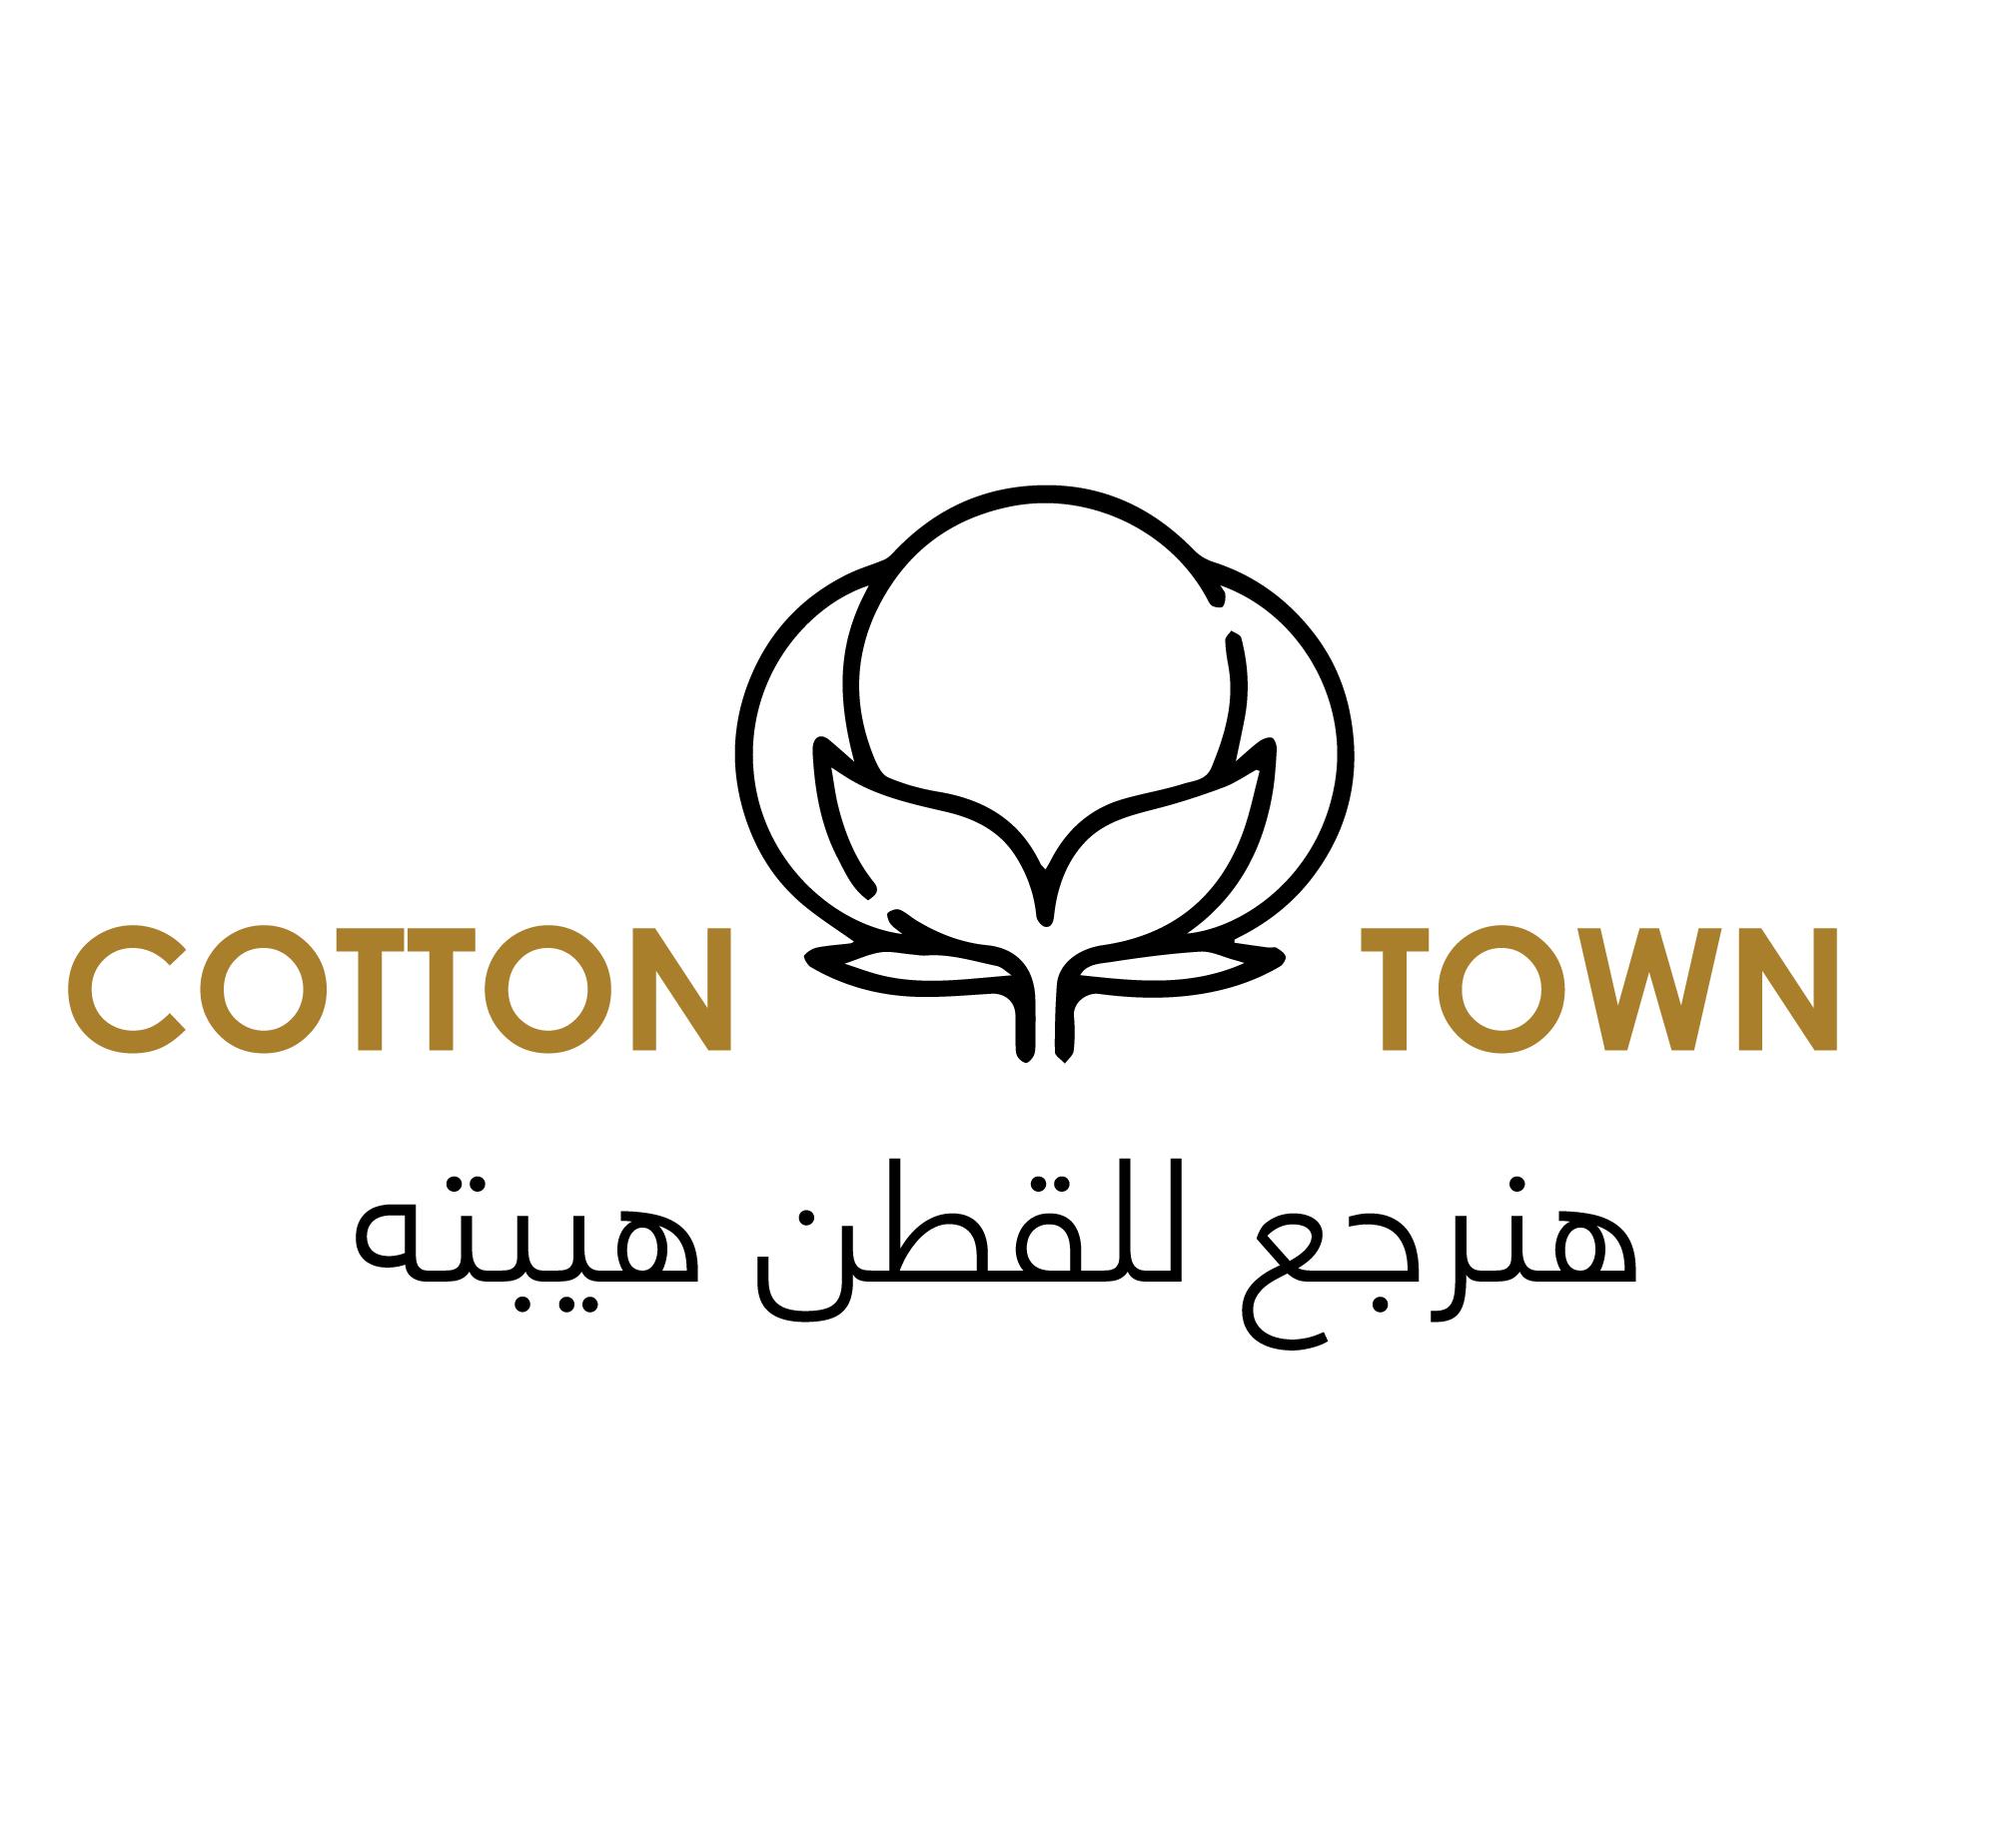 Cotton Town